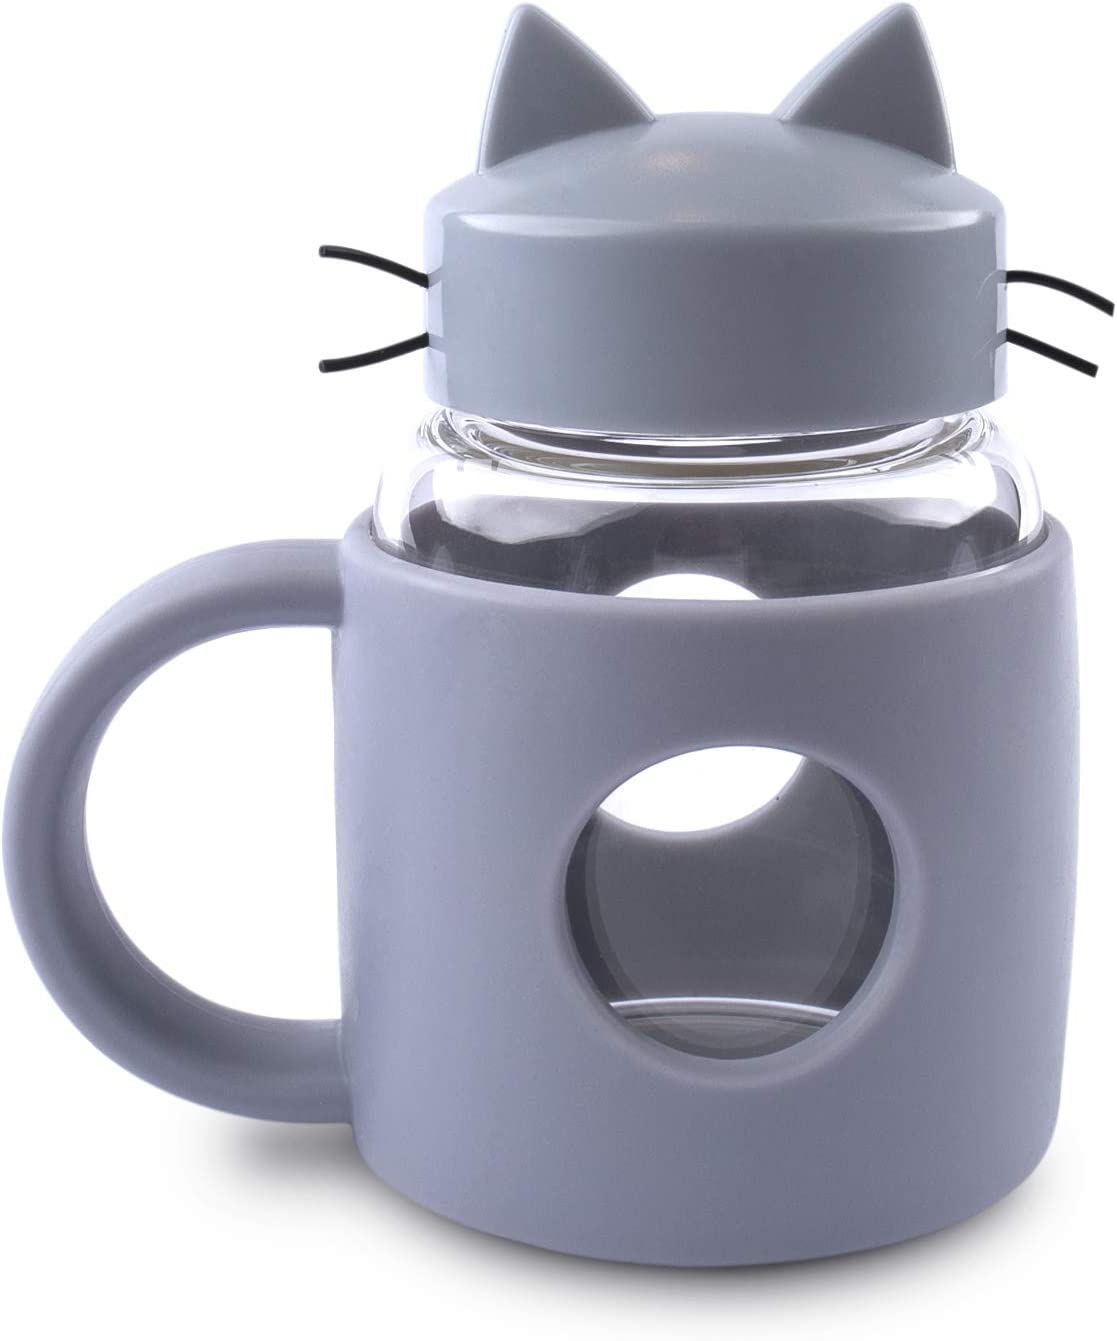 Handmade Glass Crazy Cat lovers Tea Cup or Coffee Kawaii Mug with Tail Handle, Cute Portable Teacup, 300ml 10oz Glass Mason Jar with Lid and High Heat Resistance